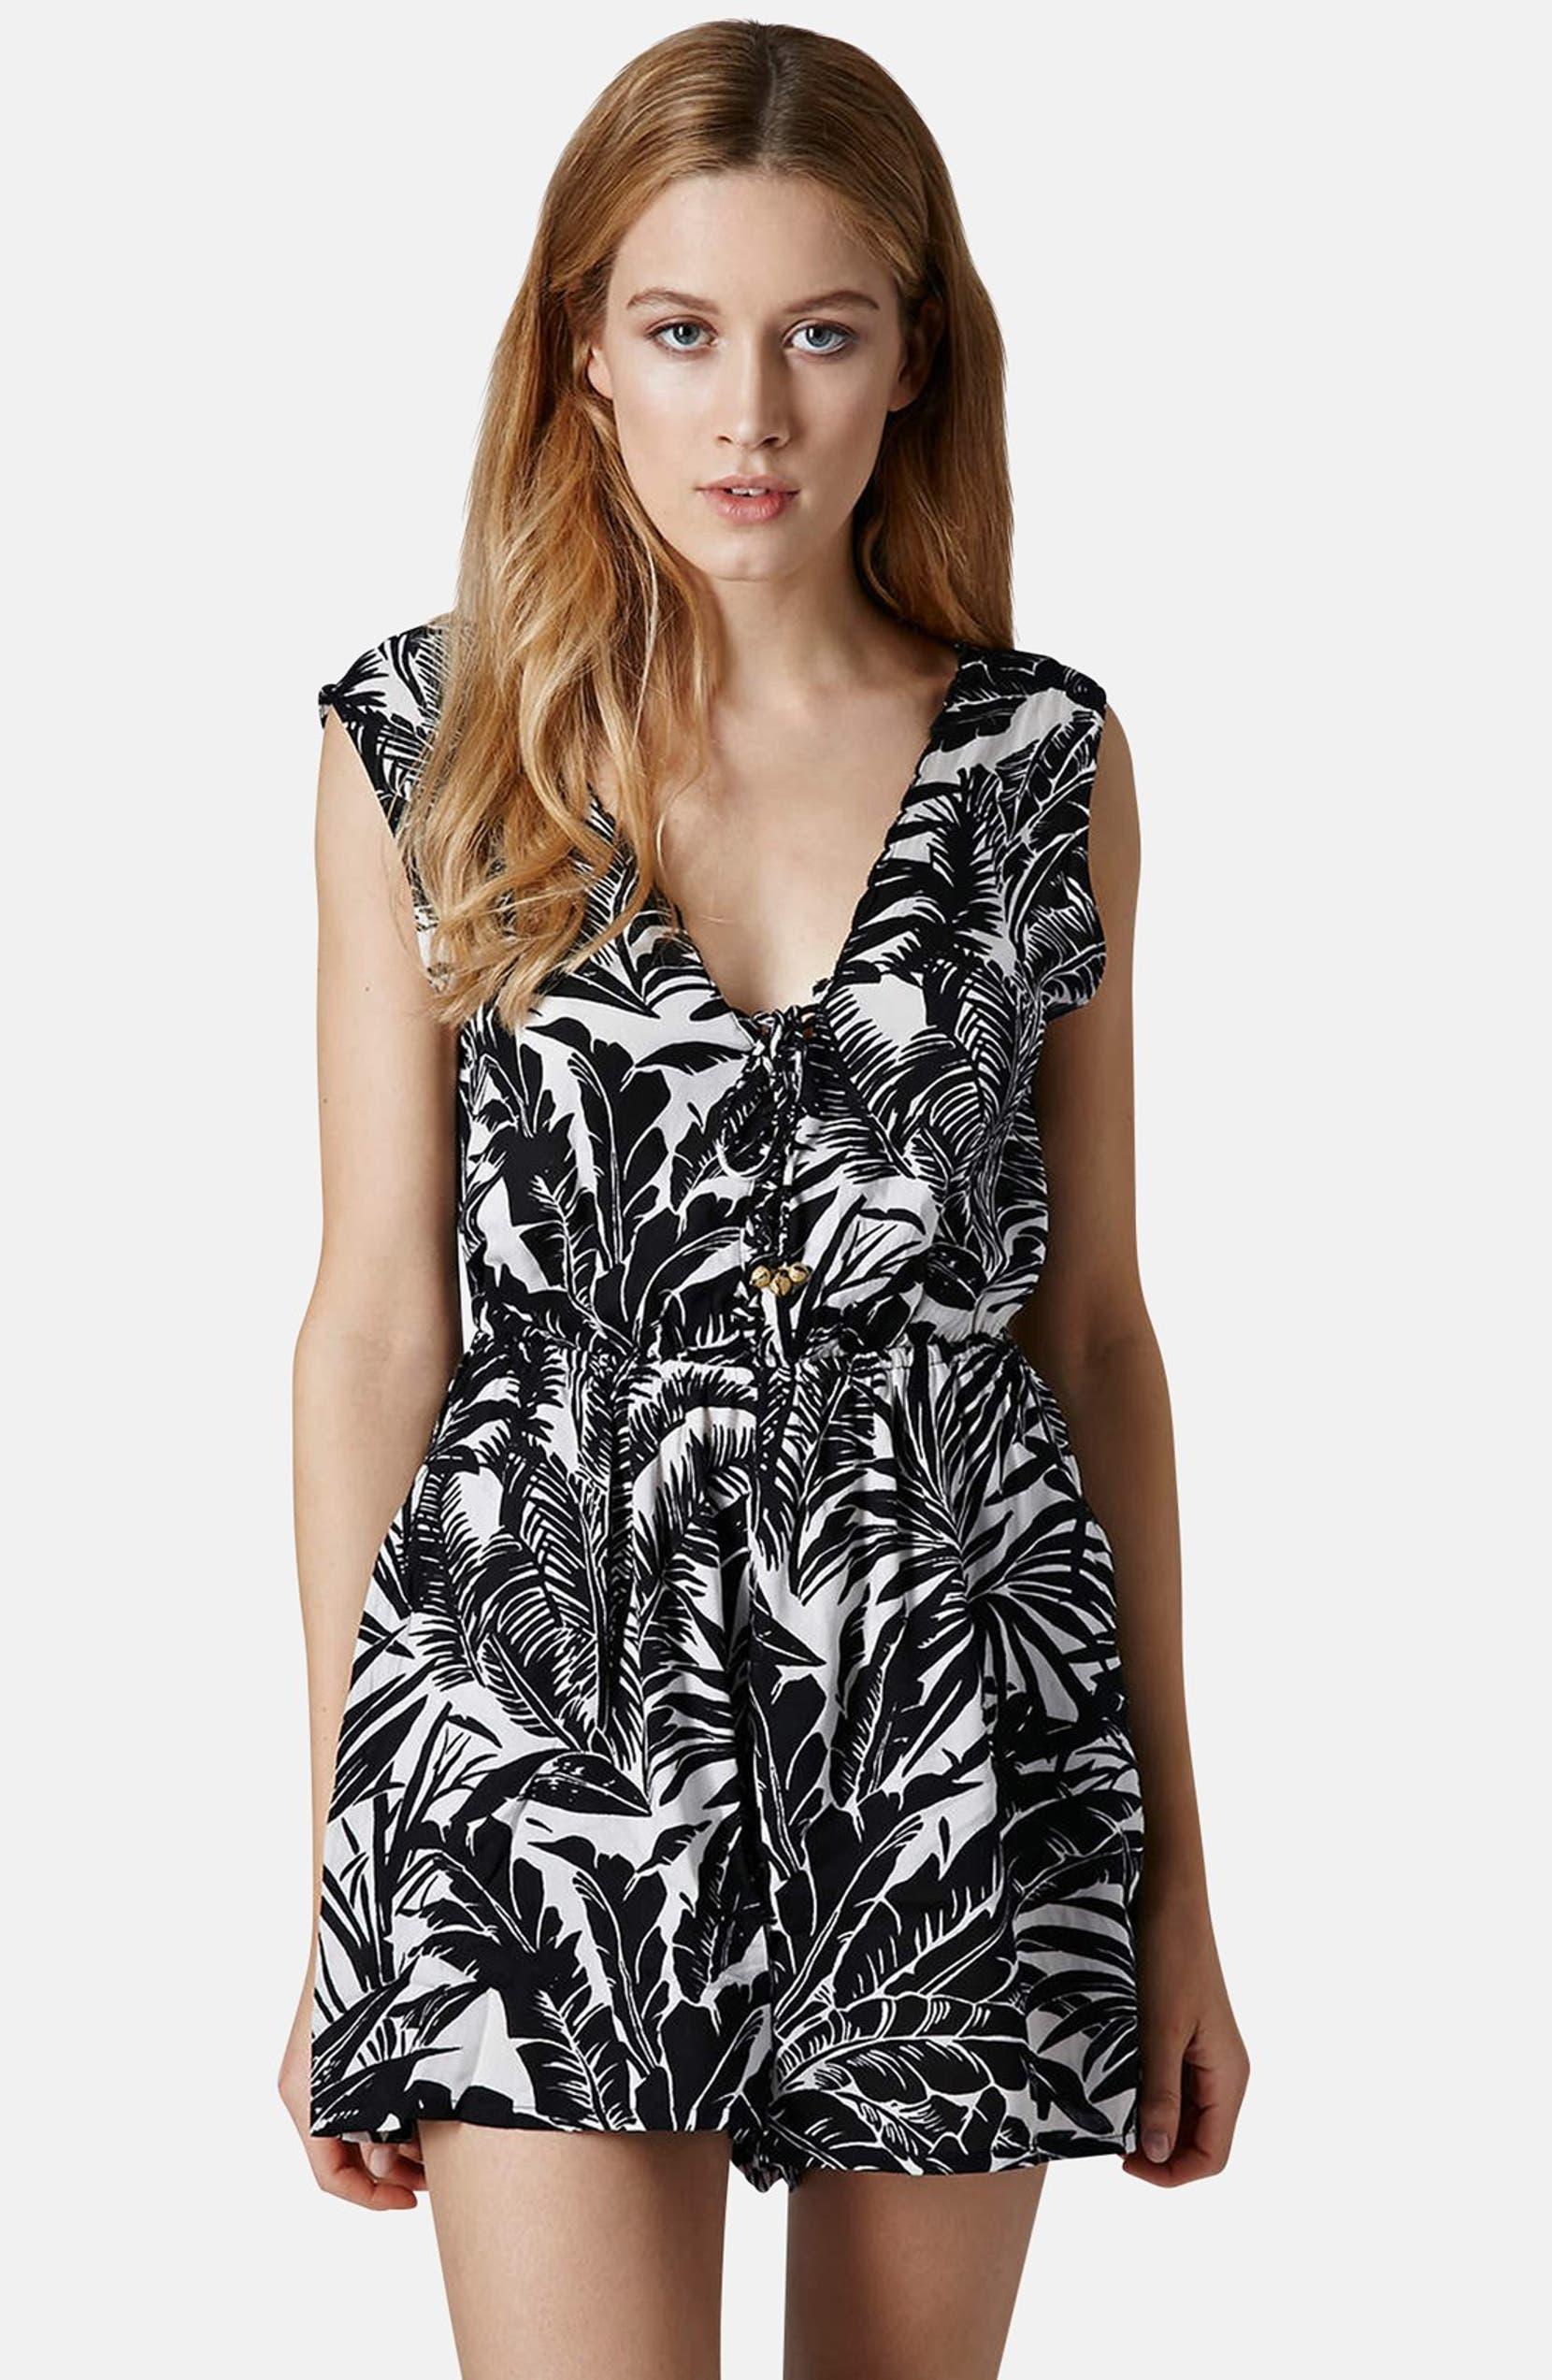 575c2cc9fa2 Topshop Palm Print Lace-Up Romper